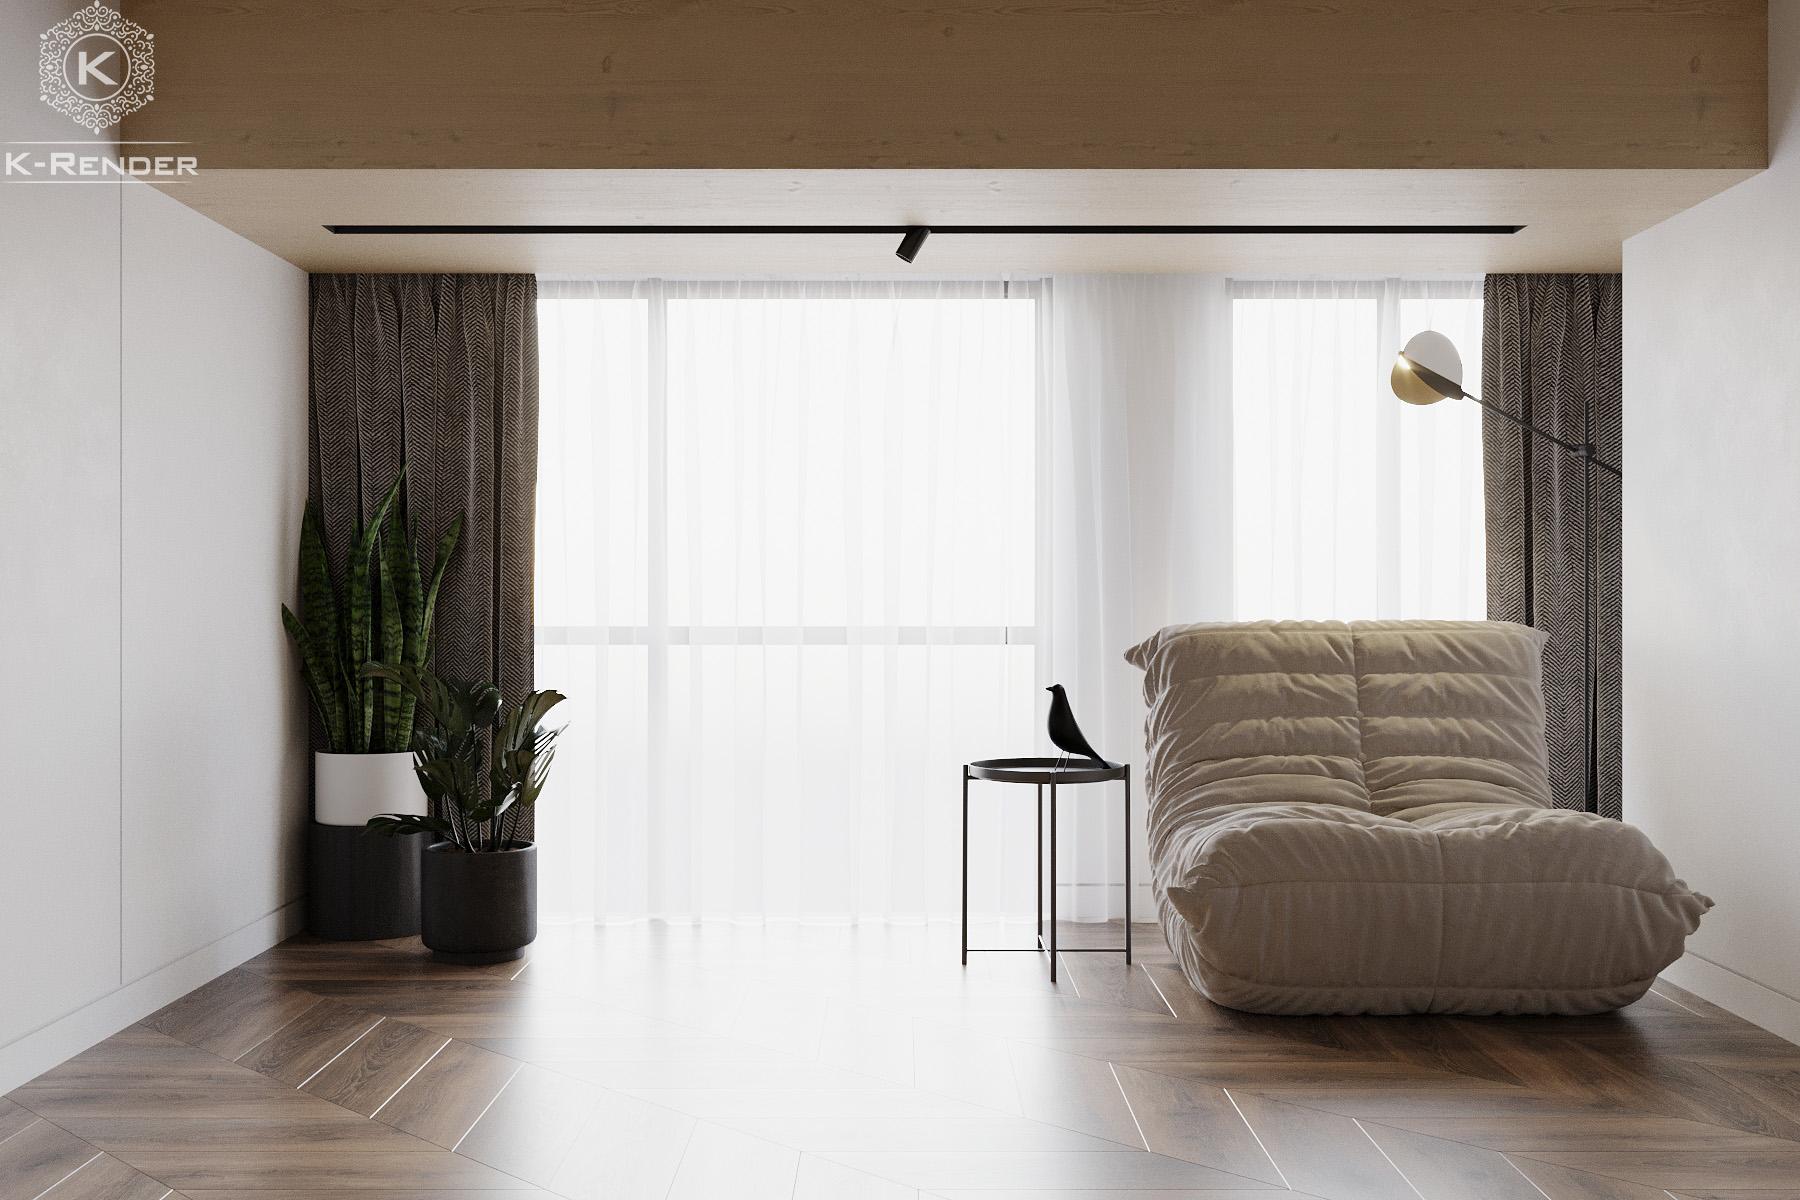 sunshine-apartment-k-render-studio-3d-rendering-studio-8